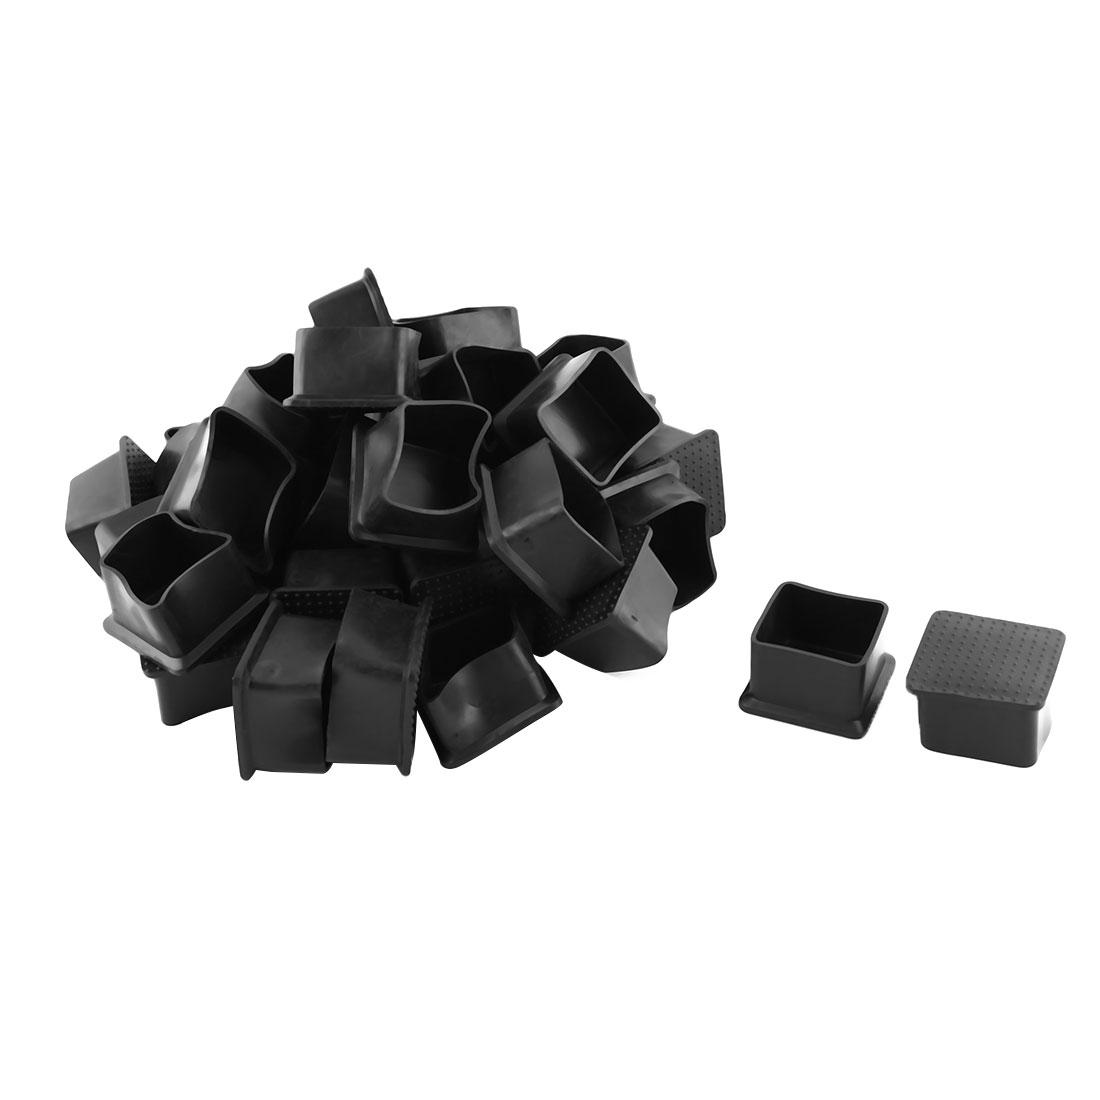 35x35mm Rubber Chair Leg Caps Tips Furniture Table Covers Floor Protectors 36pcs